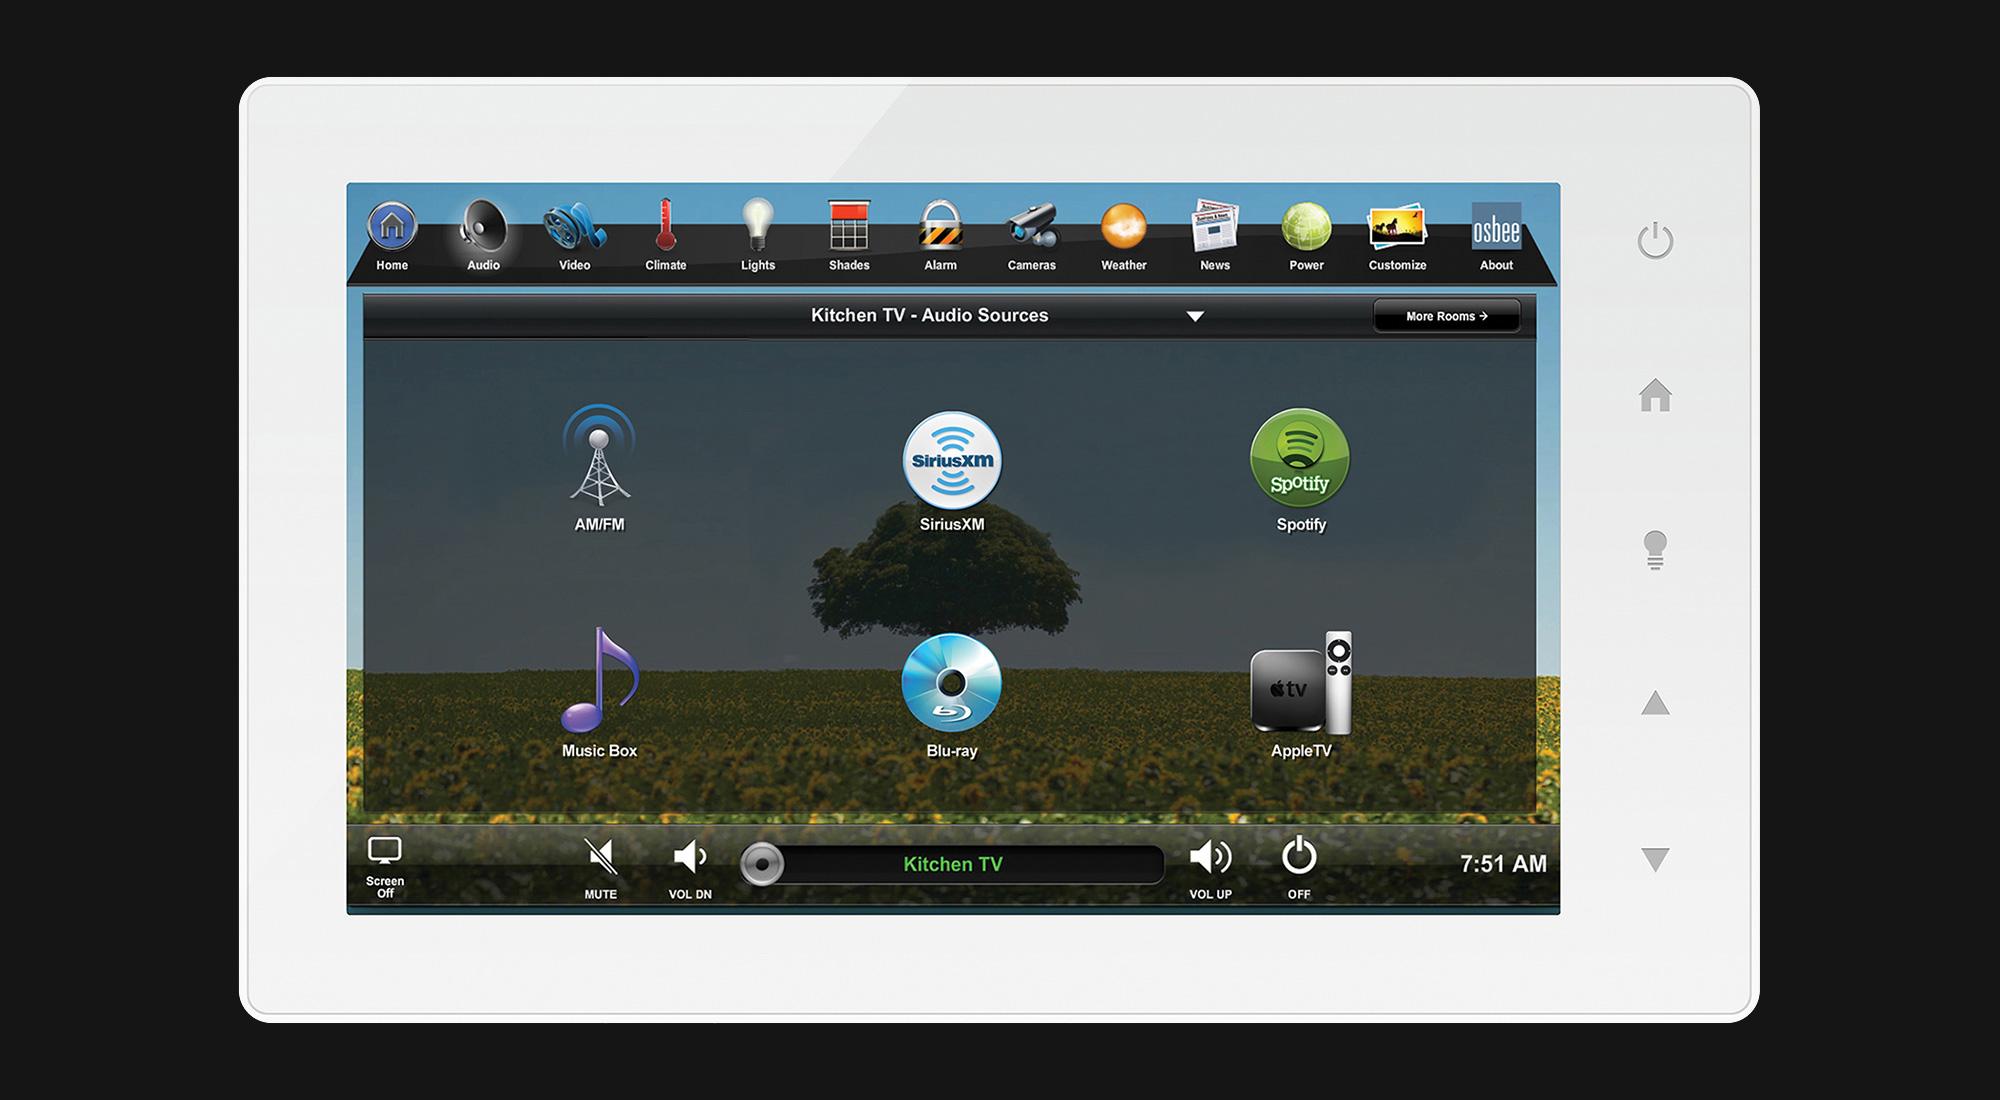 touchscreen, audio screen